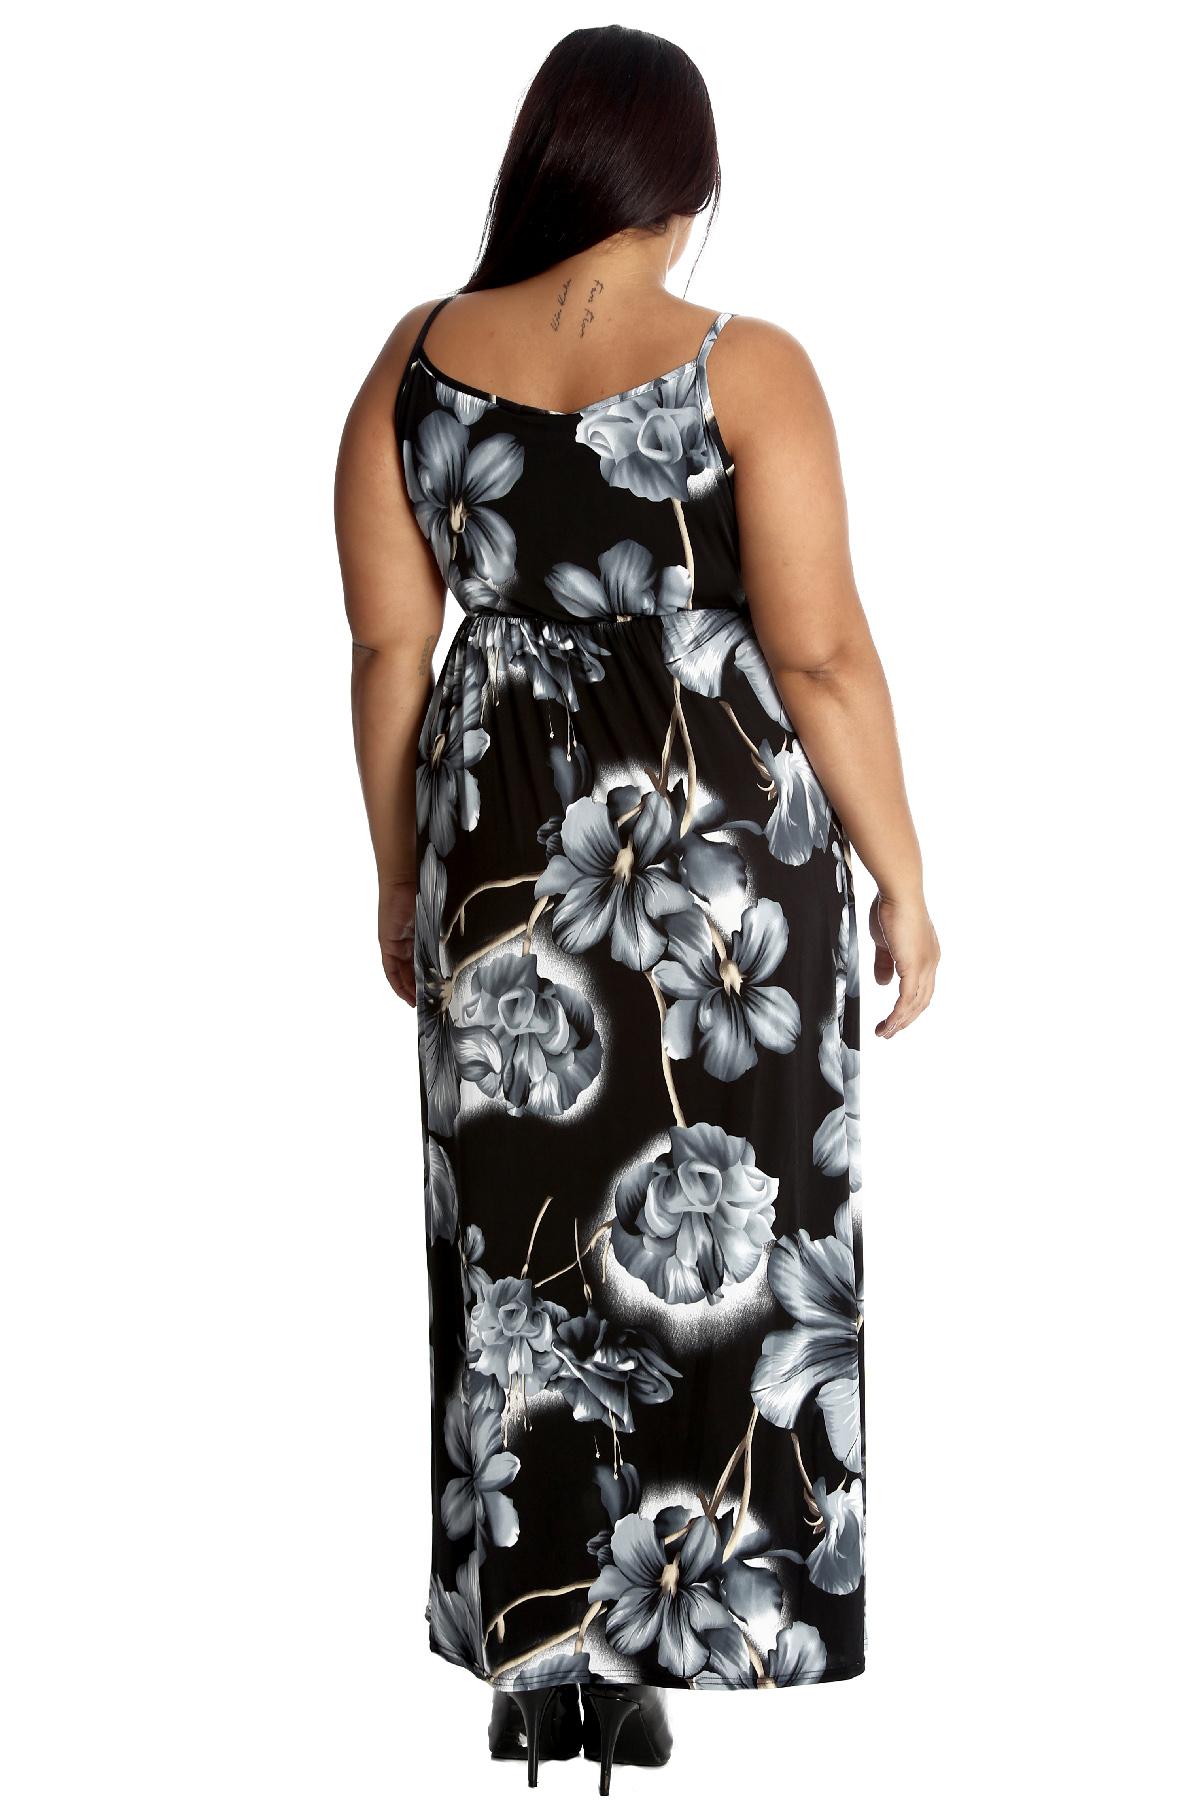 89740fb954ad New Ladies Plus Size Maxi Dress Womens Tank Top Style Sleeveless ...